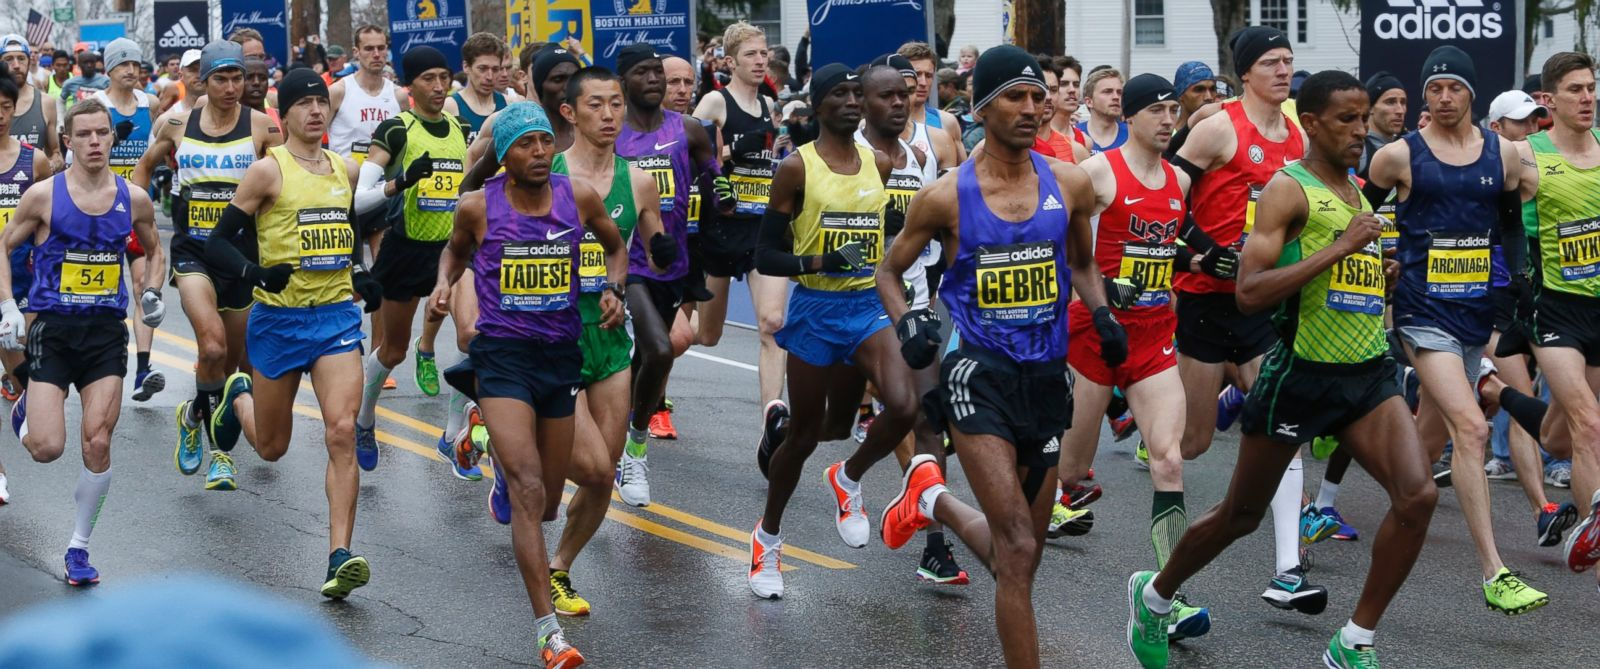 PHOTO: Elite men leave the starting line of the the 119th Boston Marathon in Hopkinton, Mass. on April 20, 2015.